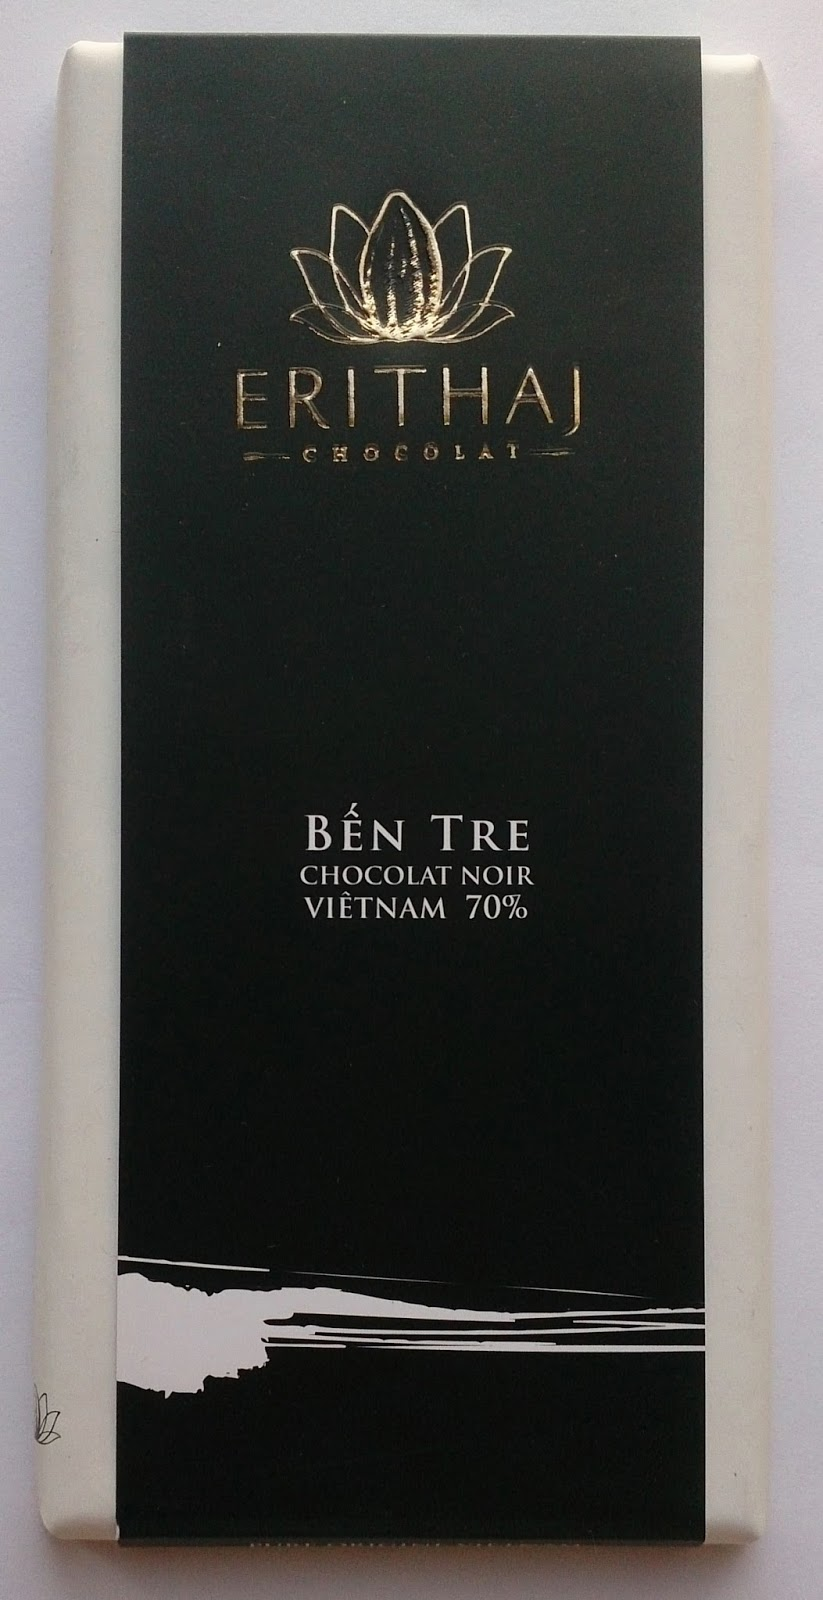 chwile zas odzenia erithaj ben tre chocolat noir vietnam 70 ciemna z wietnamu. Black Bedroom Furniture Sets. Home Design Ideas